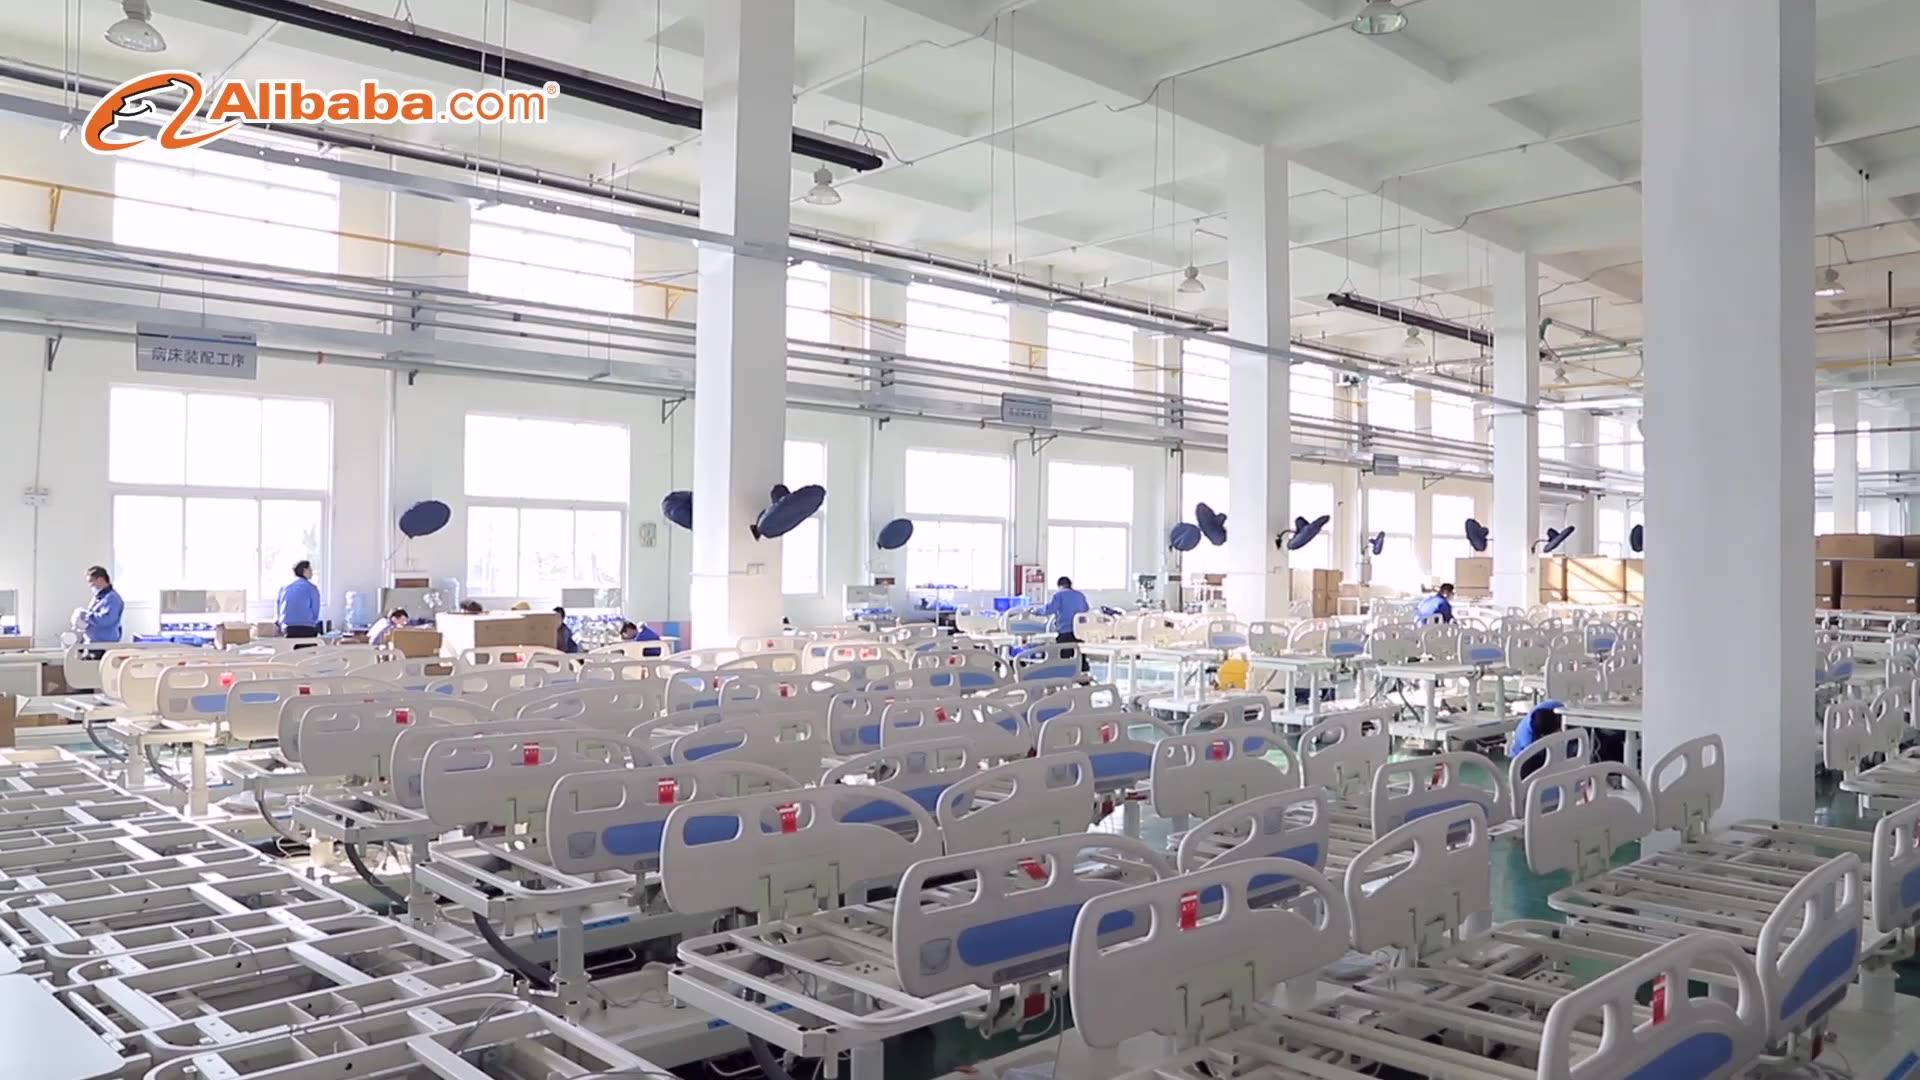 मेडिकल पुस्तिका अस्पताल सोफे तीन क्रैंक रोगी के लिए alluminium siderail धातु अस्पताल के बिस्तर